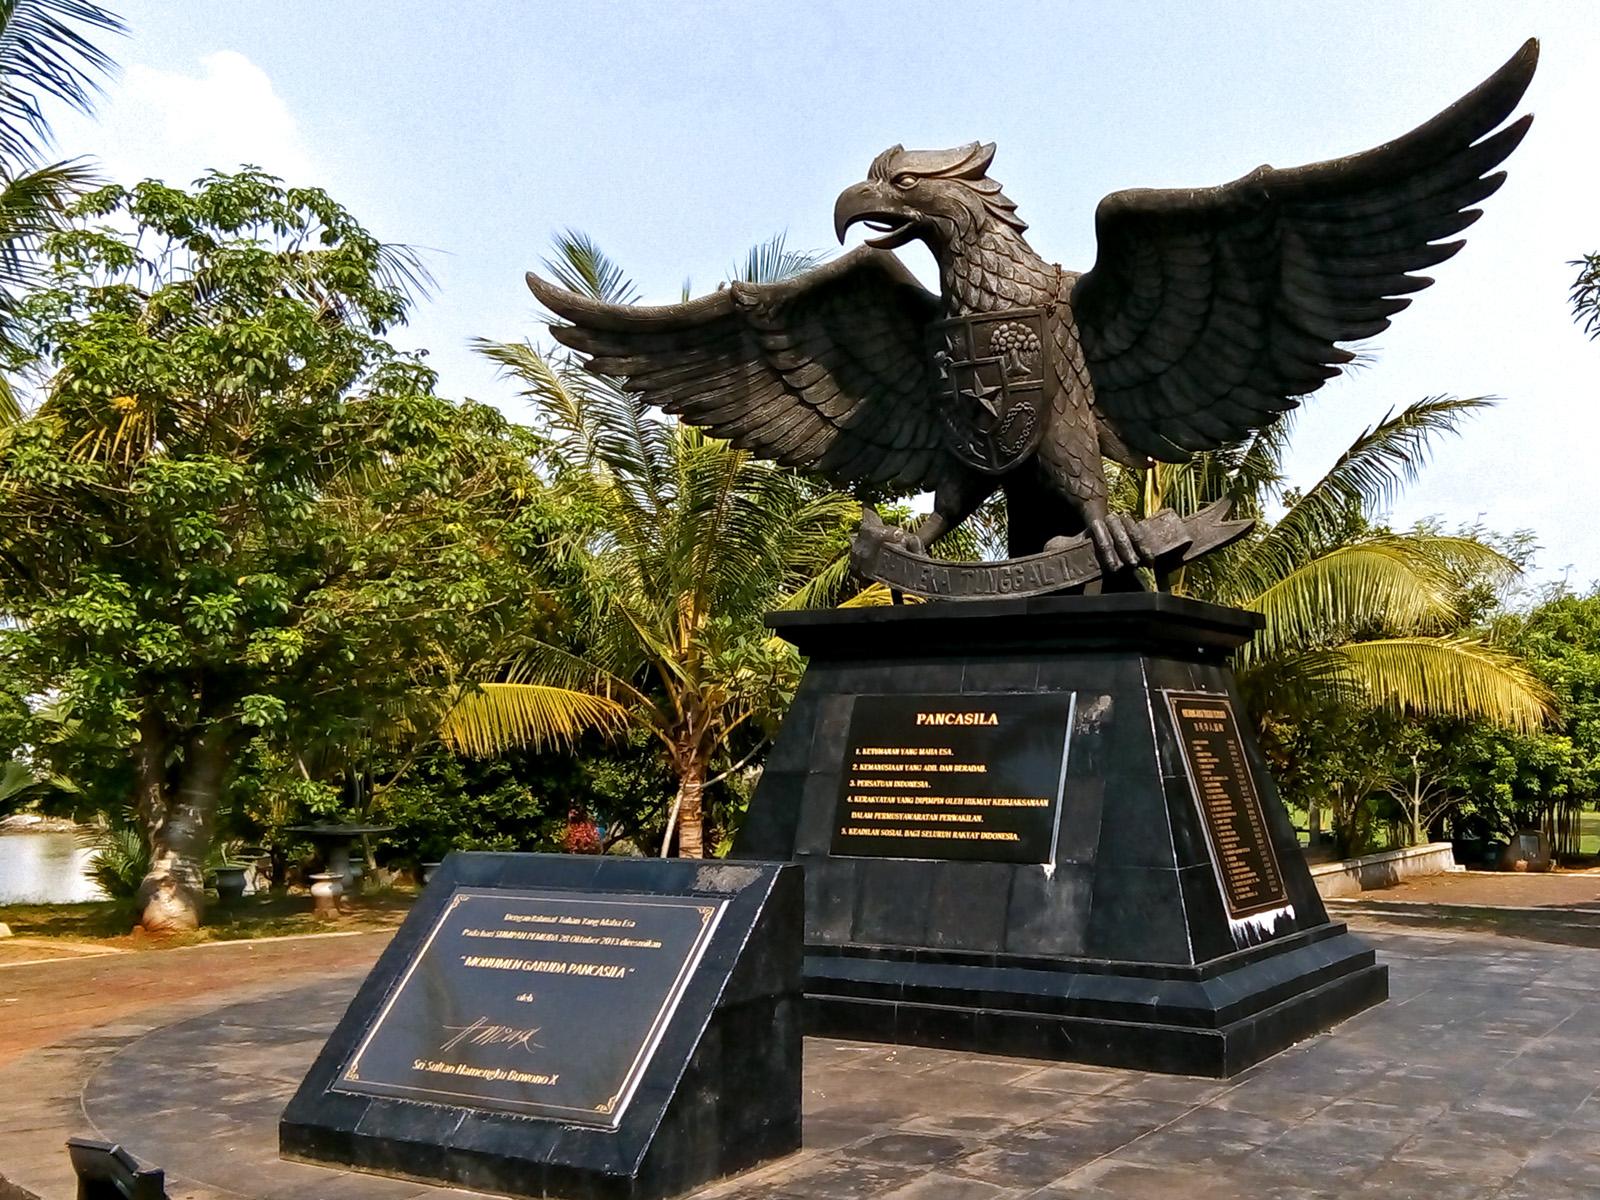 """Monumen Garuda Pancasila"" im Chinese-Indonesian Cultural Park in Jakarta © Baba Neko Baka, Flickr"